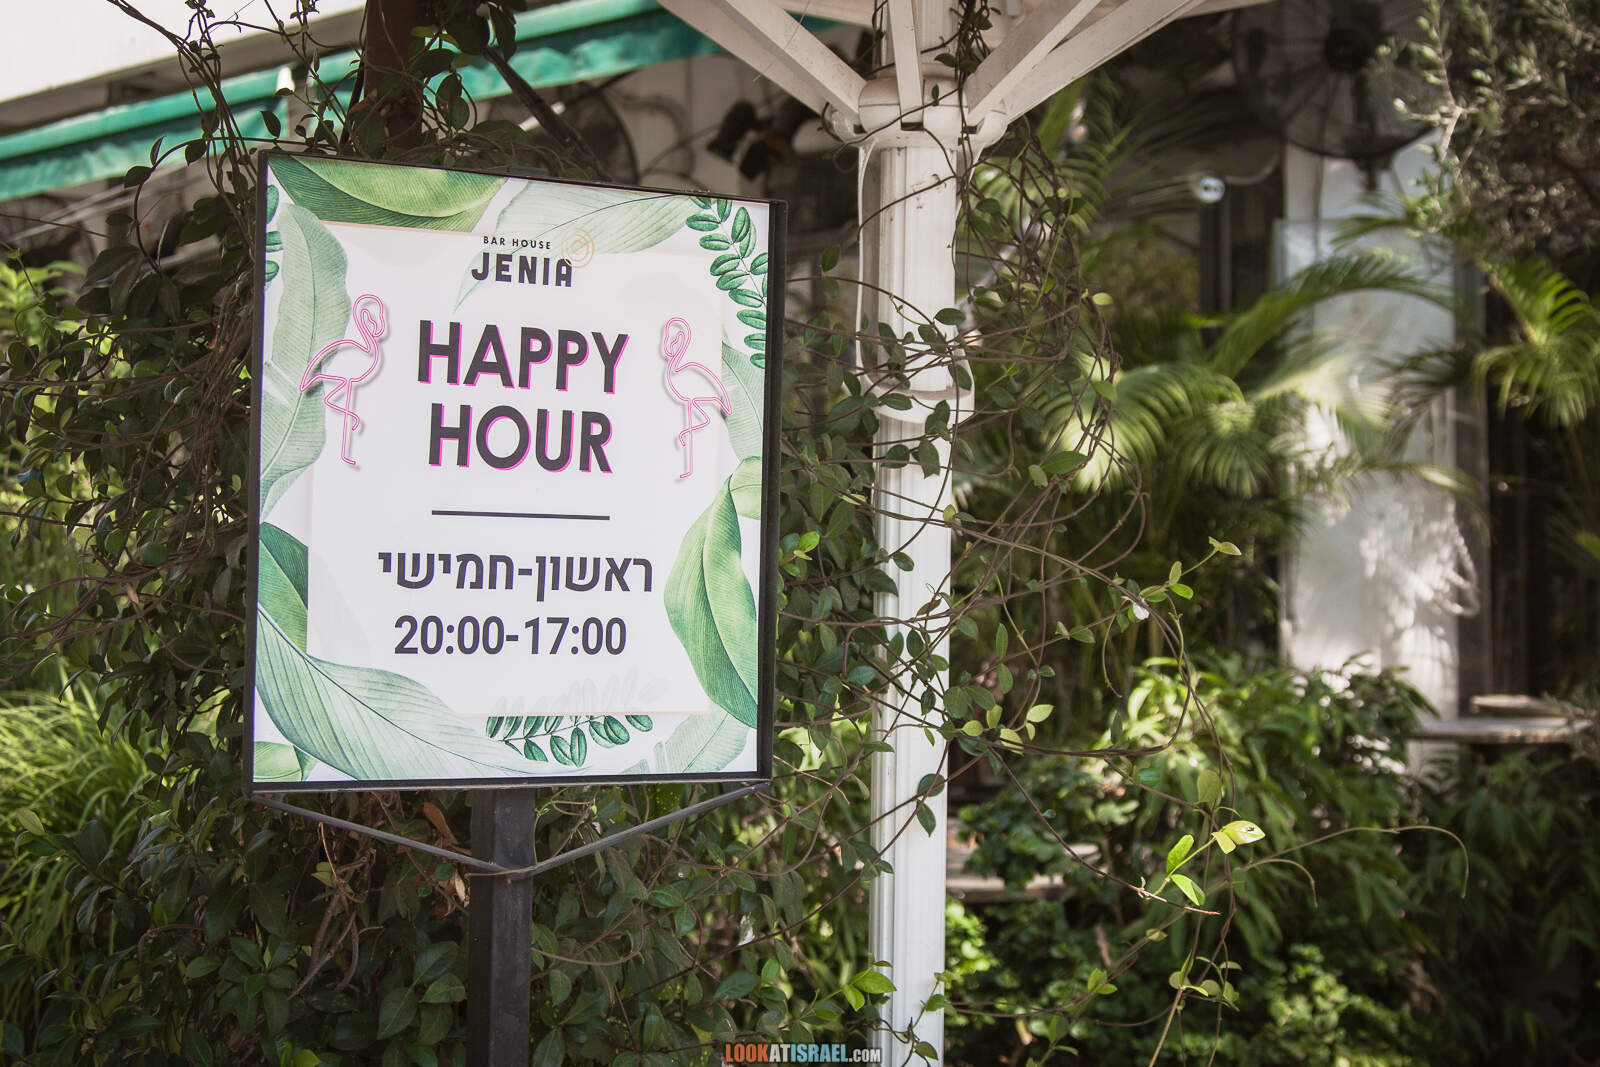 Тель-Авив, улица Дизенгофф во время карантина   Lockdown on beaches of Tel Aviv   LookAtIsrael.com - Фото путешествия по Израилю